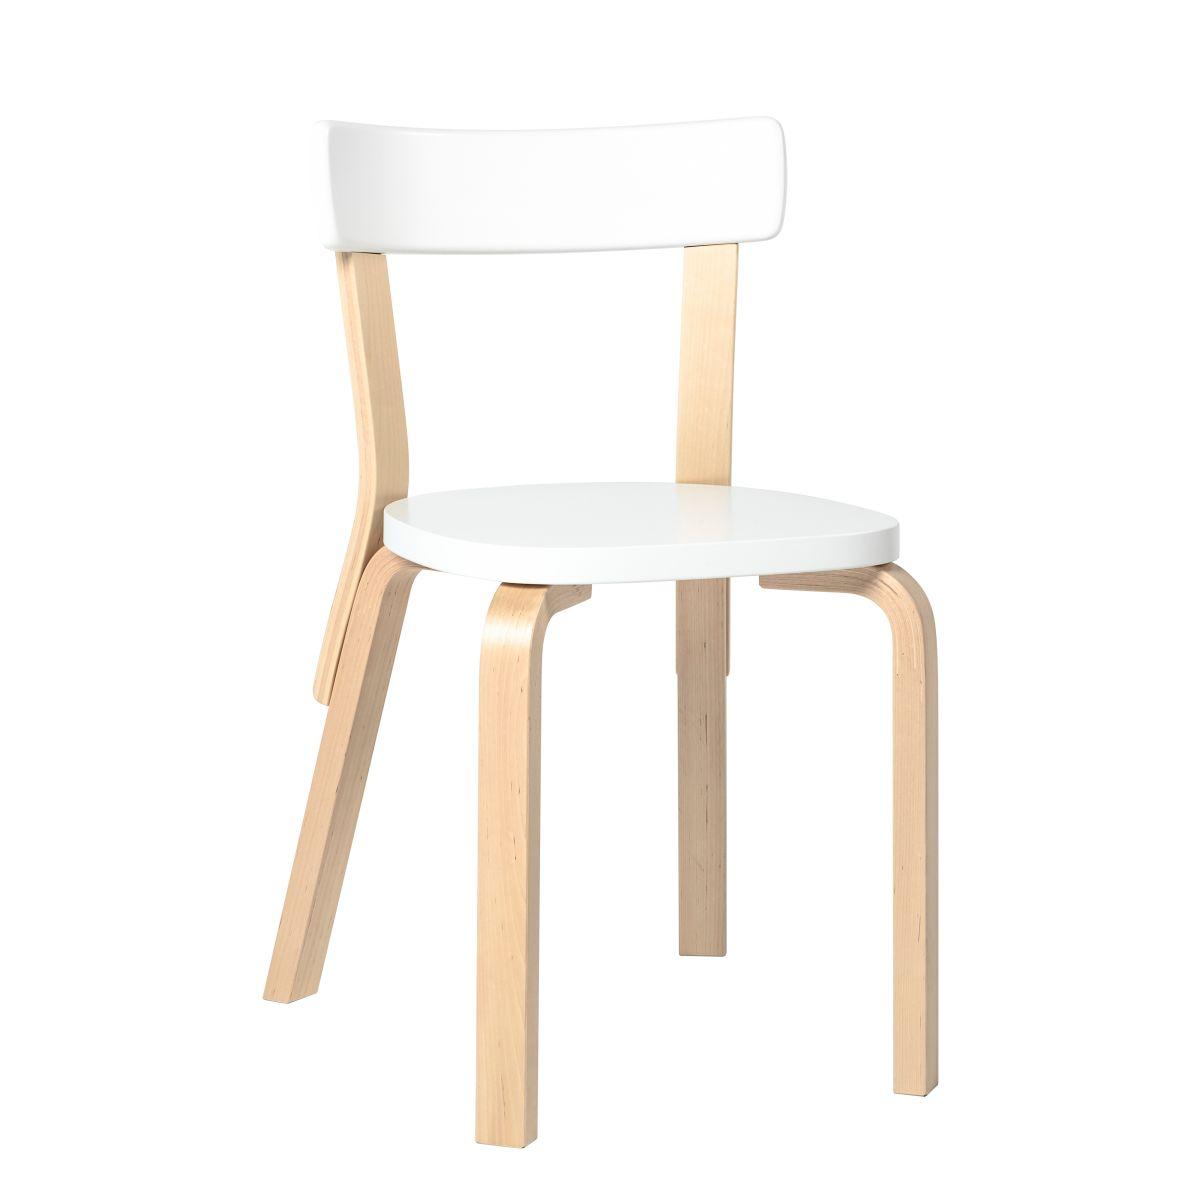 Chair 69 blawhite lacquer seat